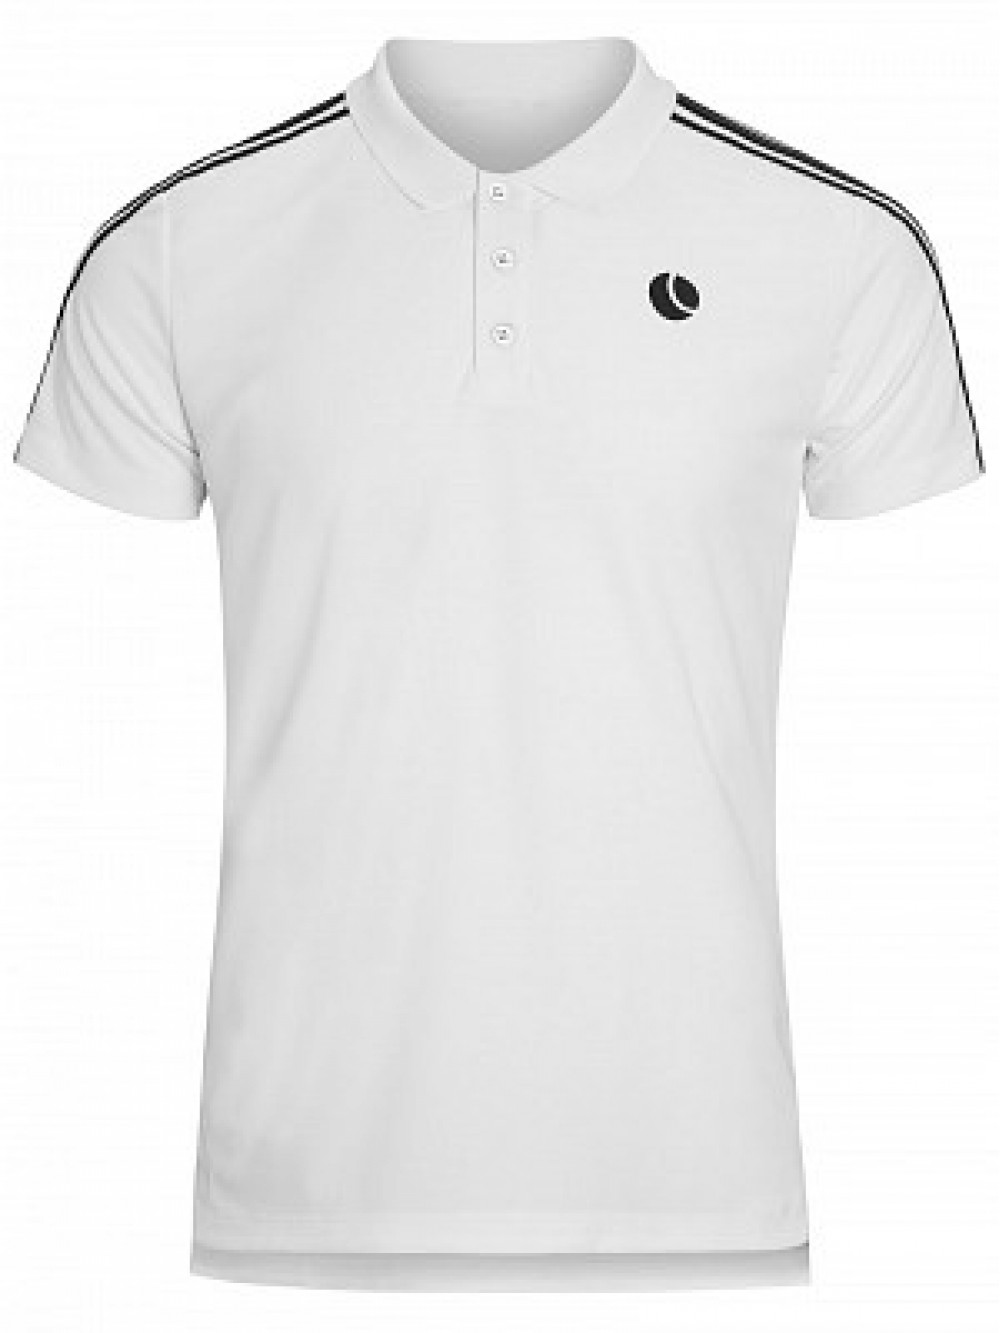 T-Shirt Björn Borg Tyler Polo Brilliant White weiß